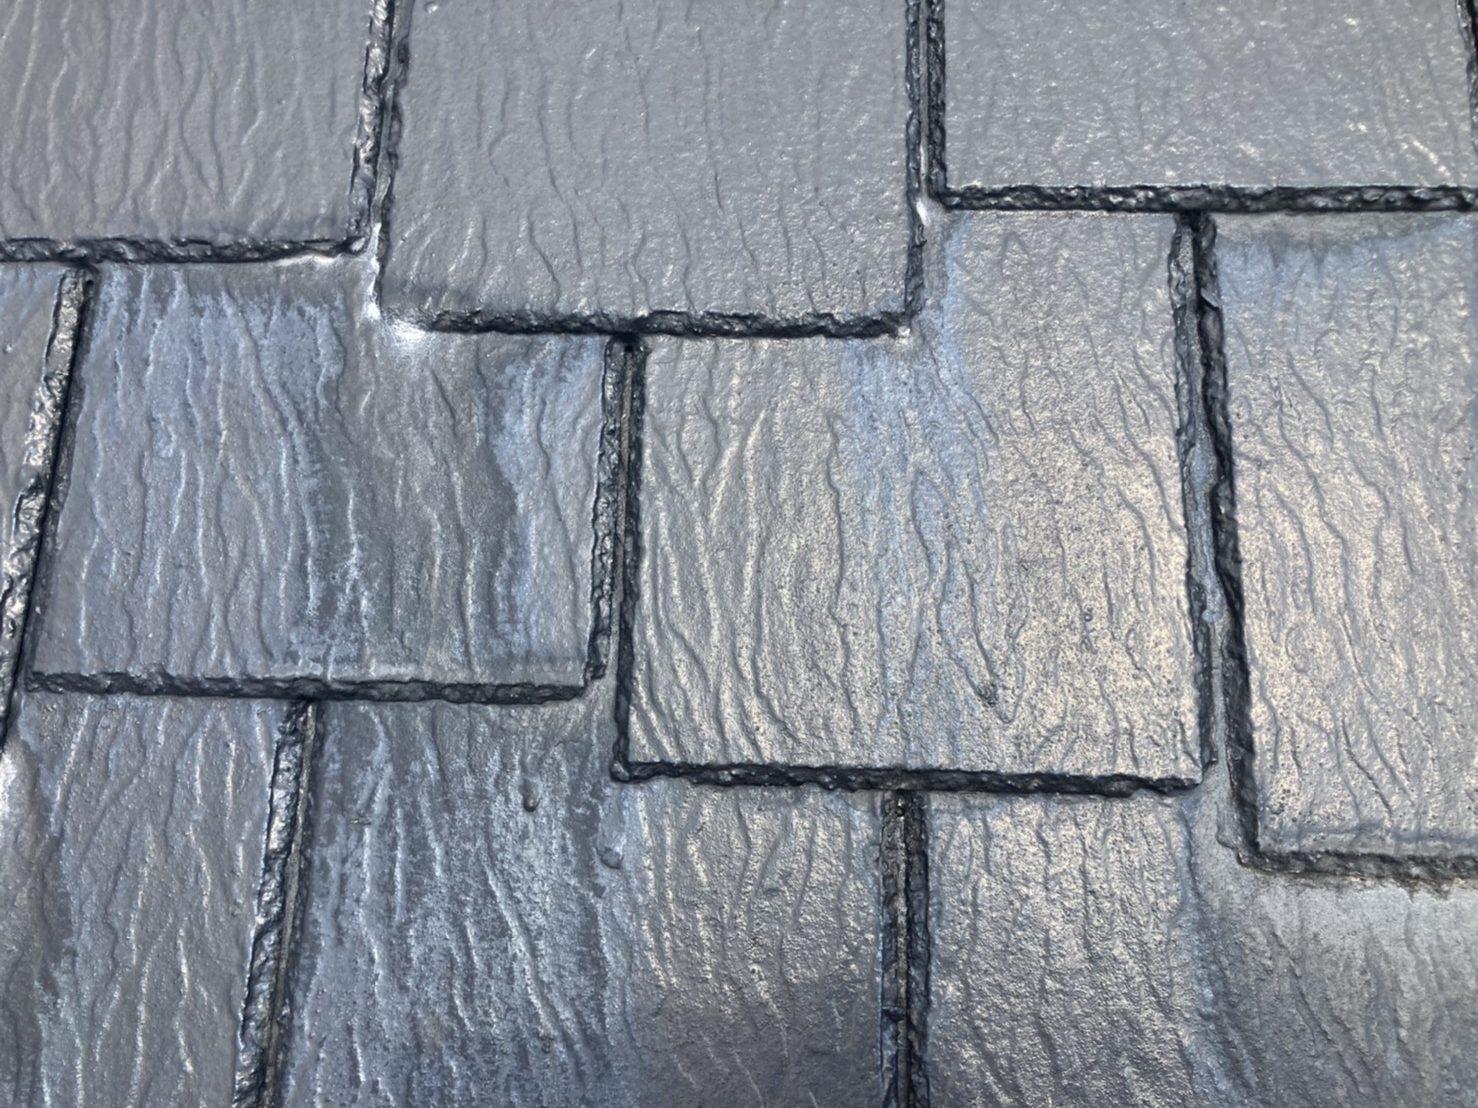 屋根材の表面